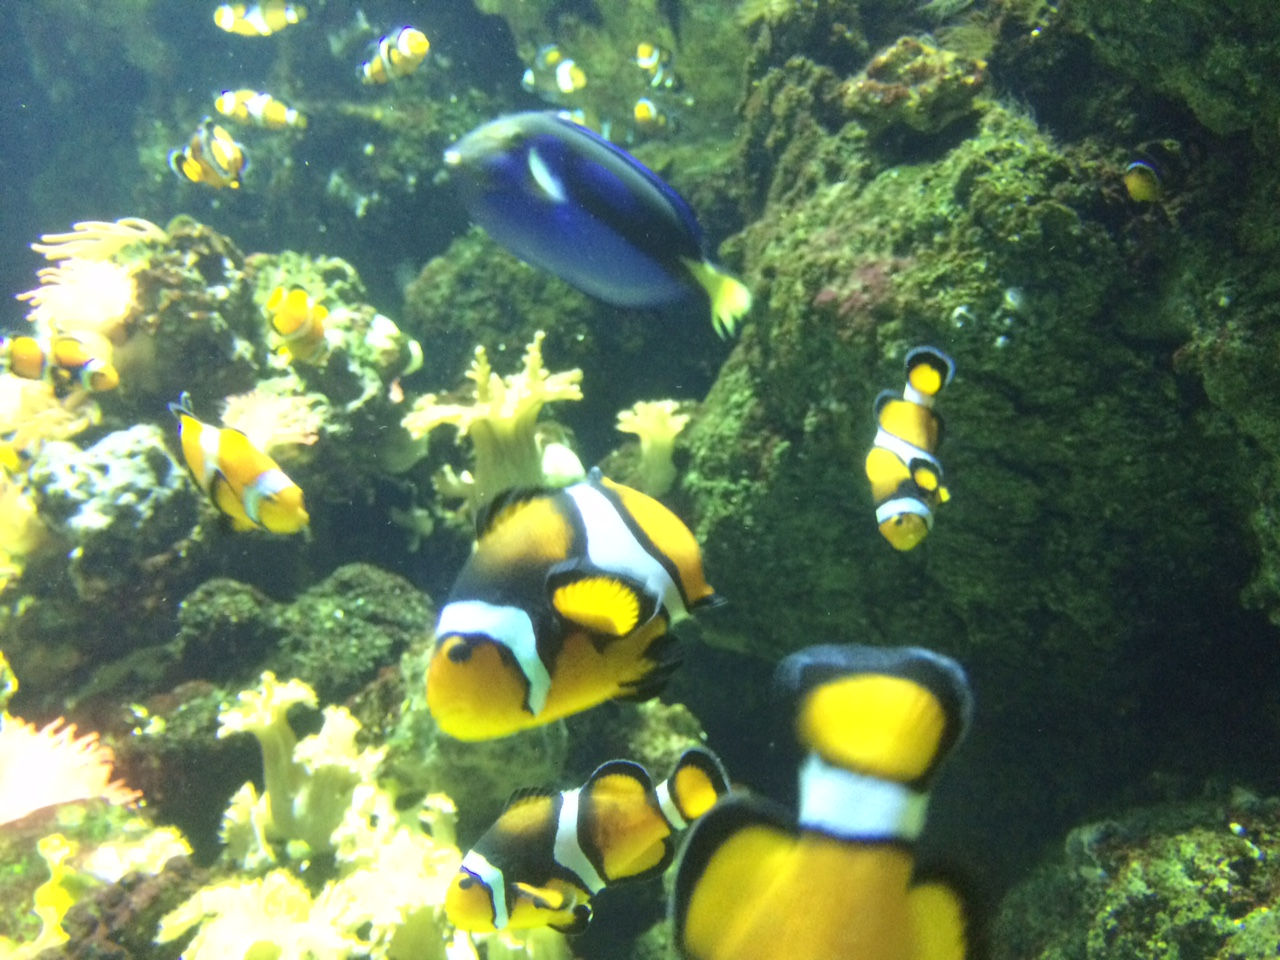 clown fish at nemos cove at the london aquarium